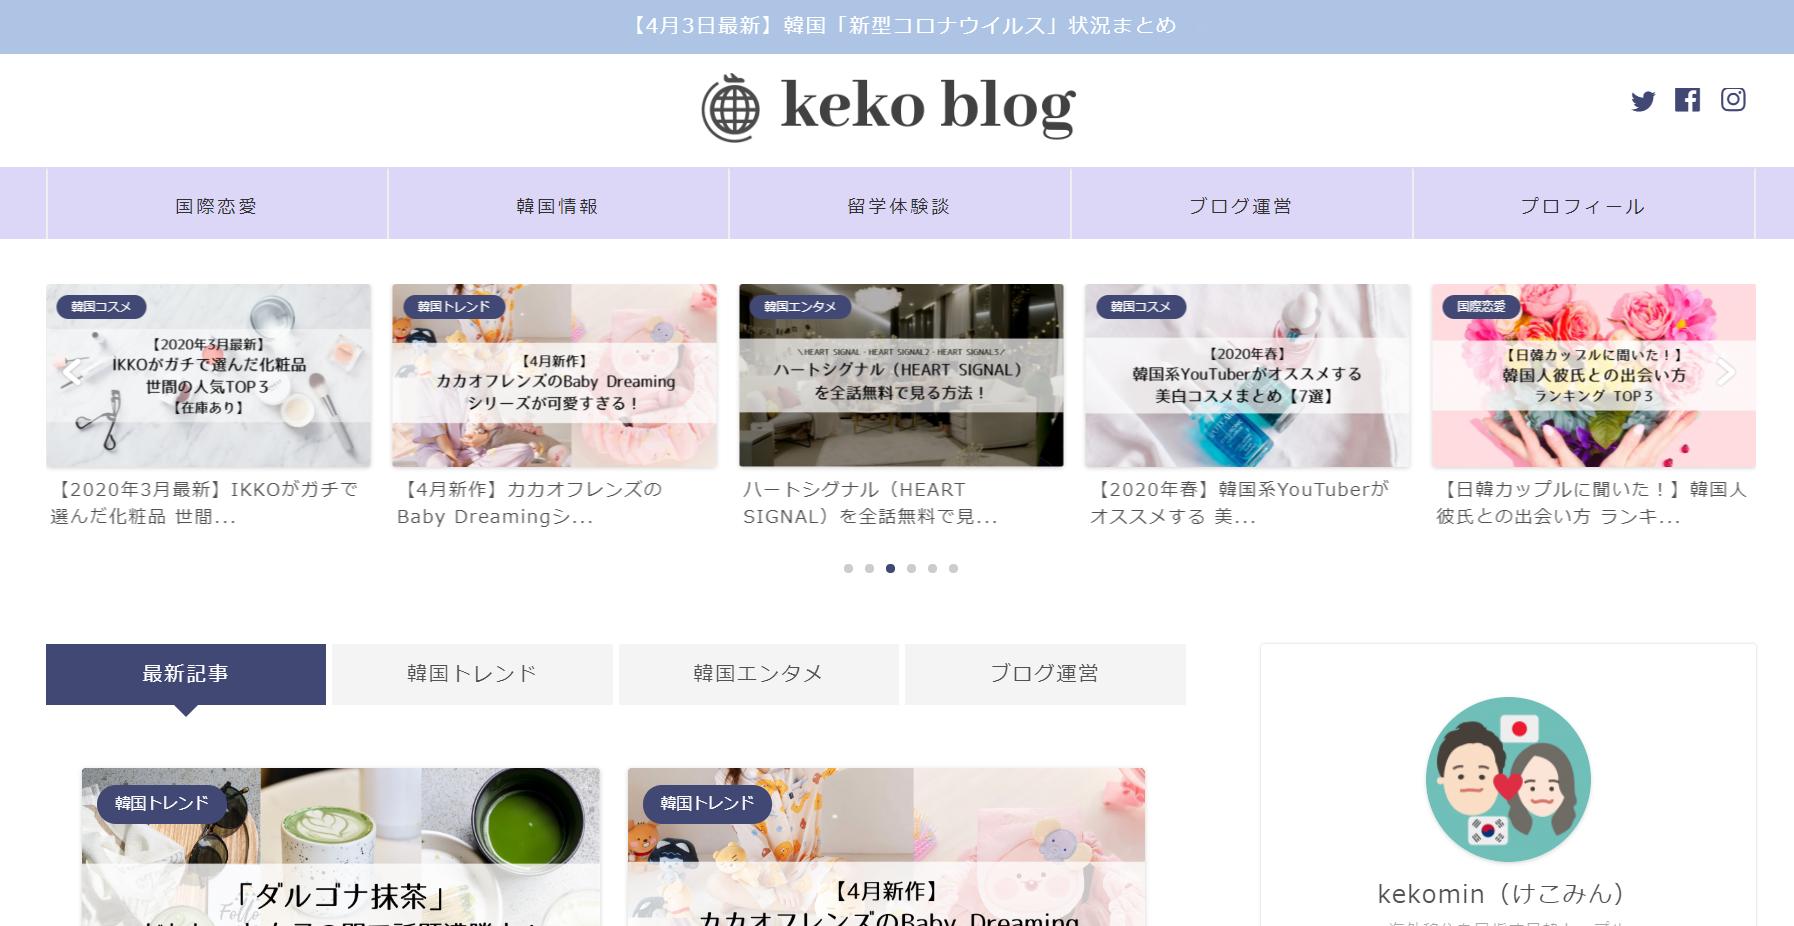 keko blog